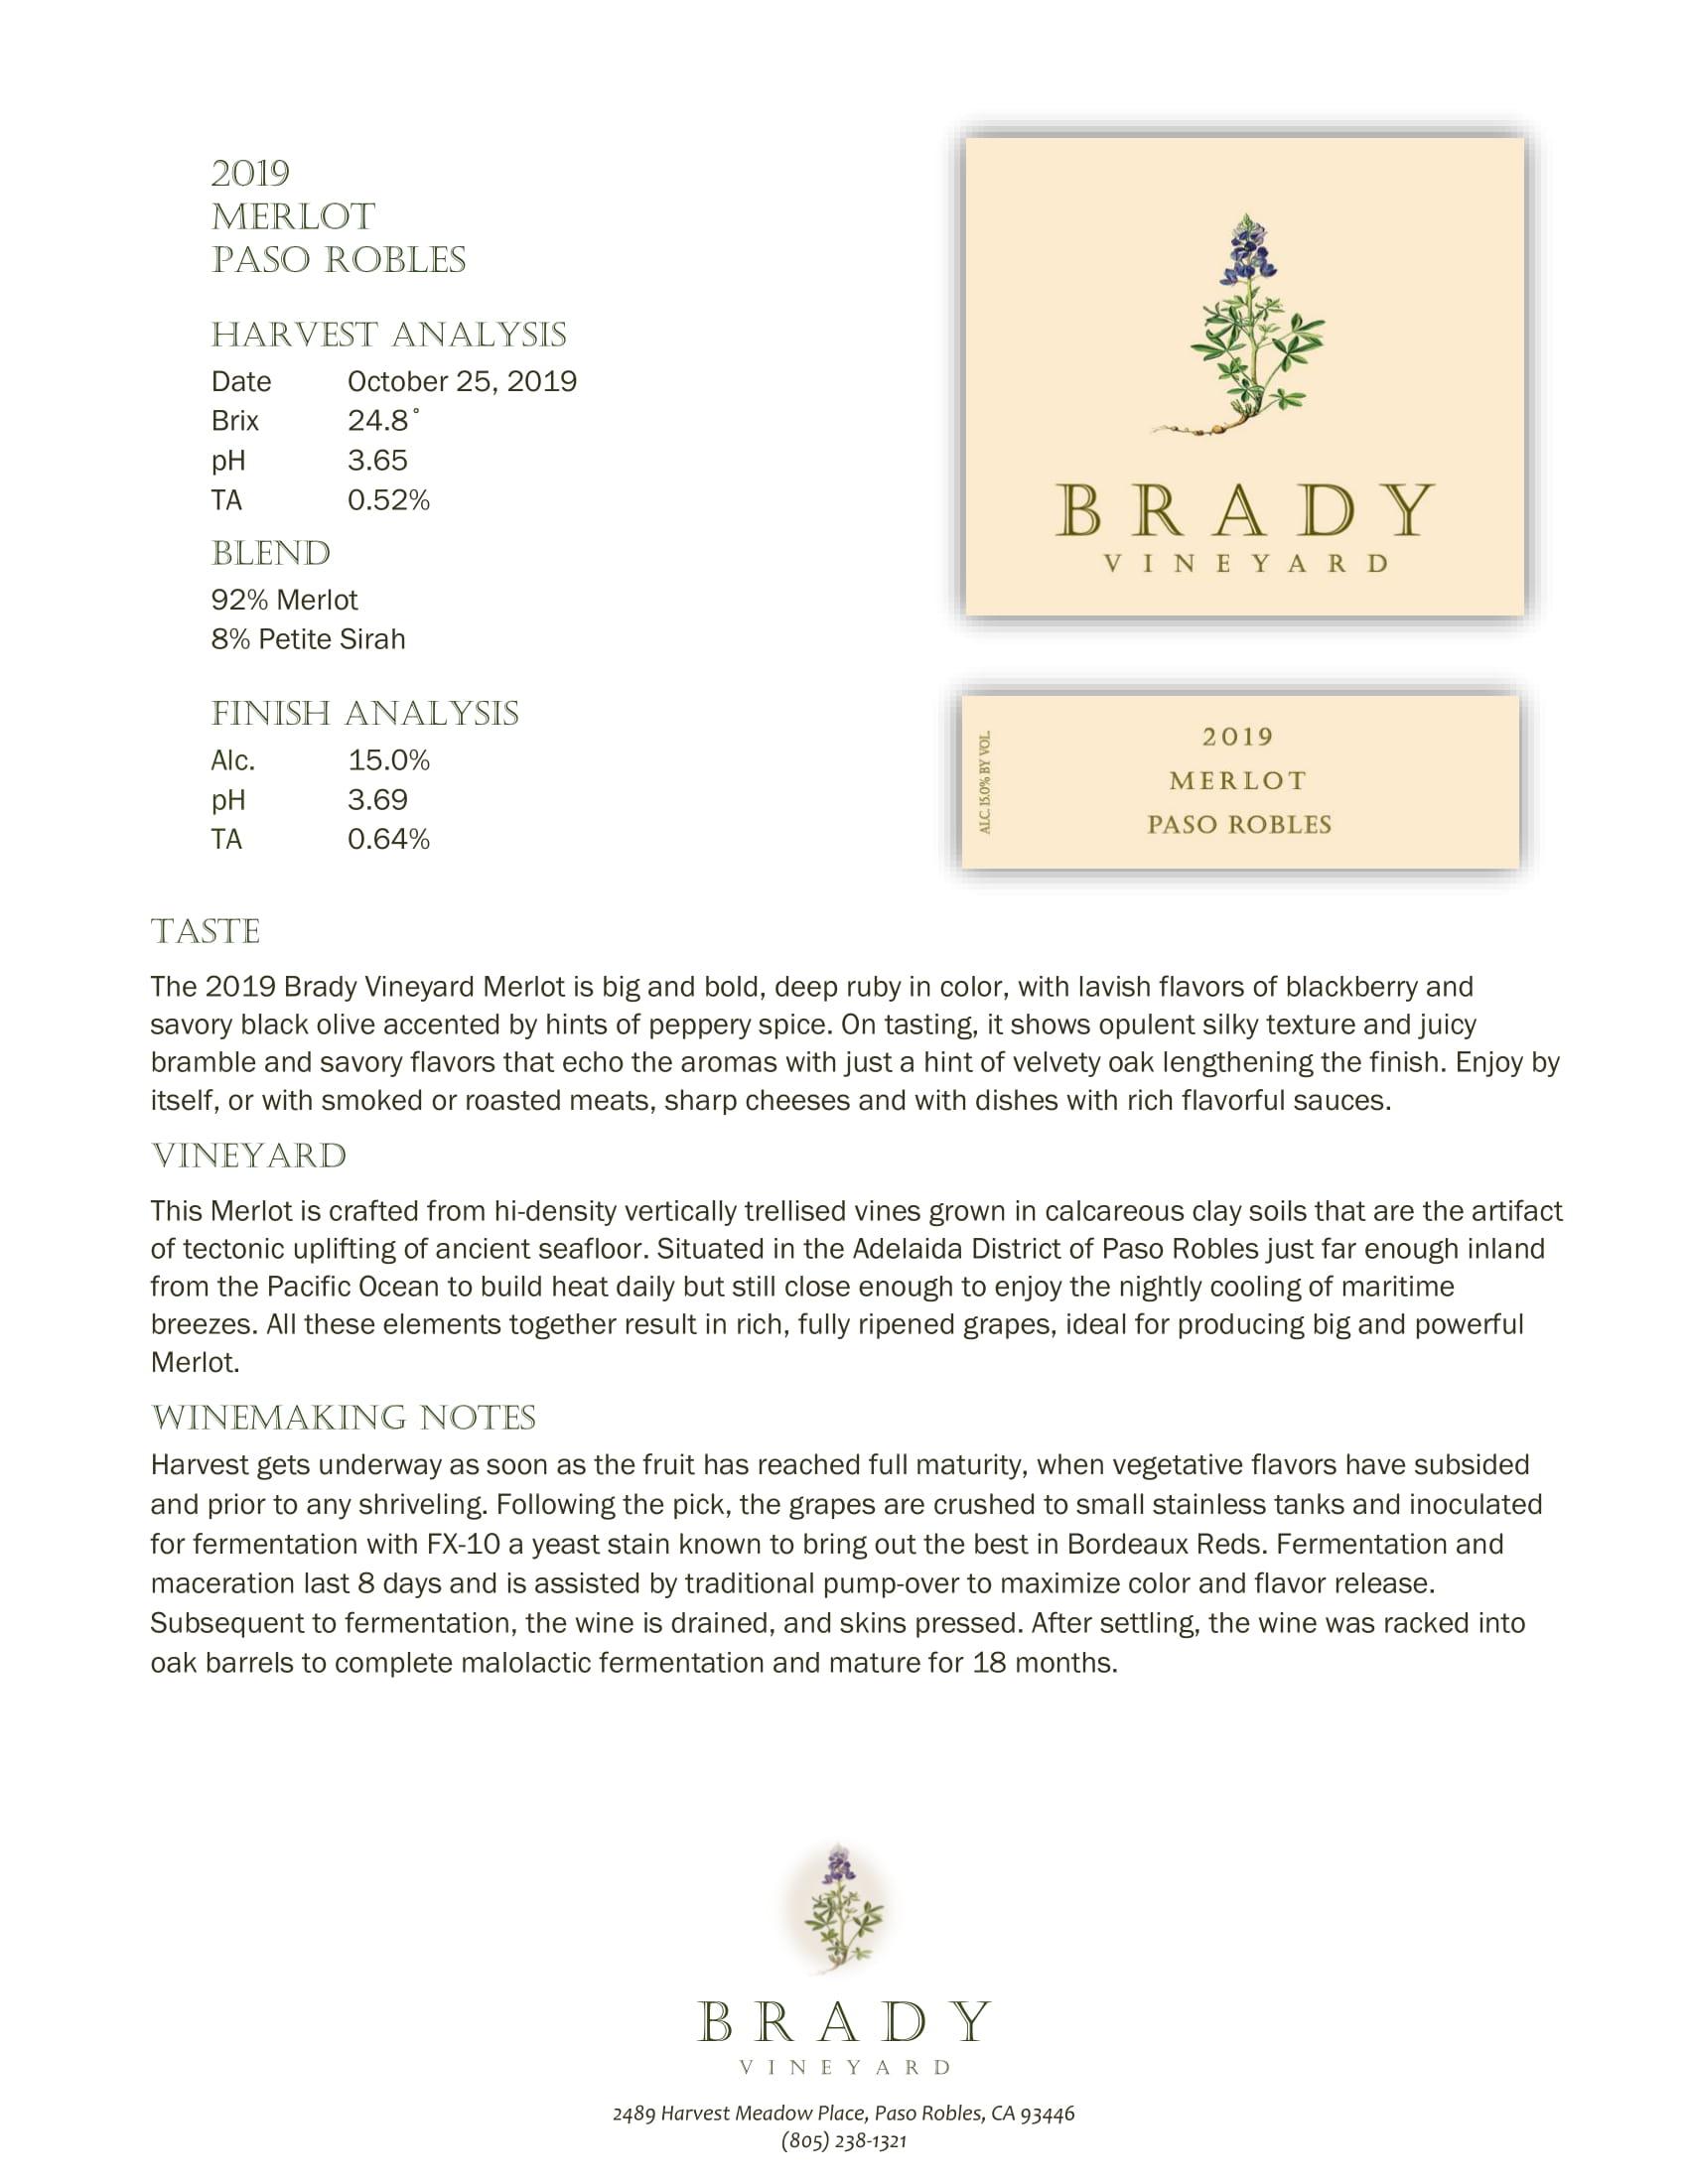 Brady Vineyards Merlot Sell Sheet